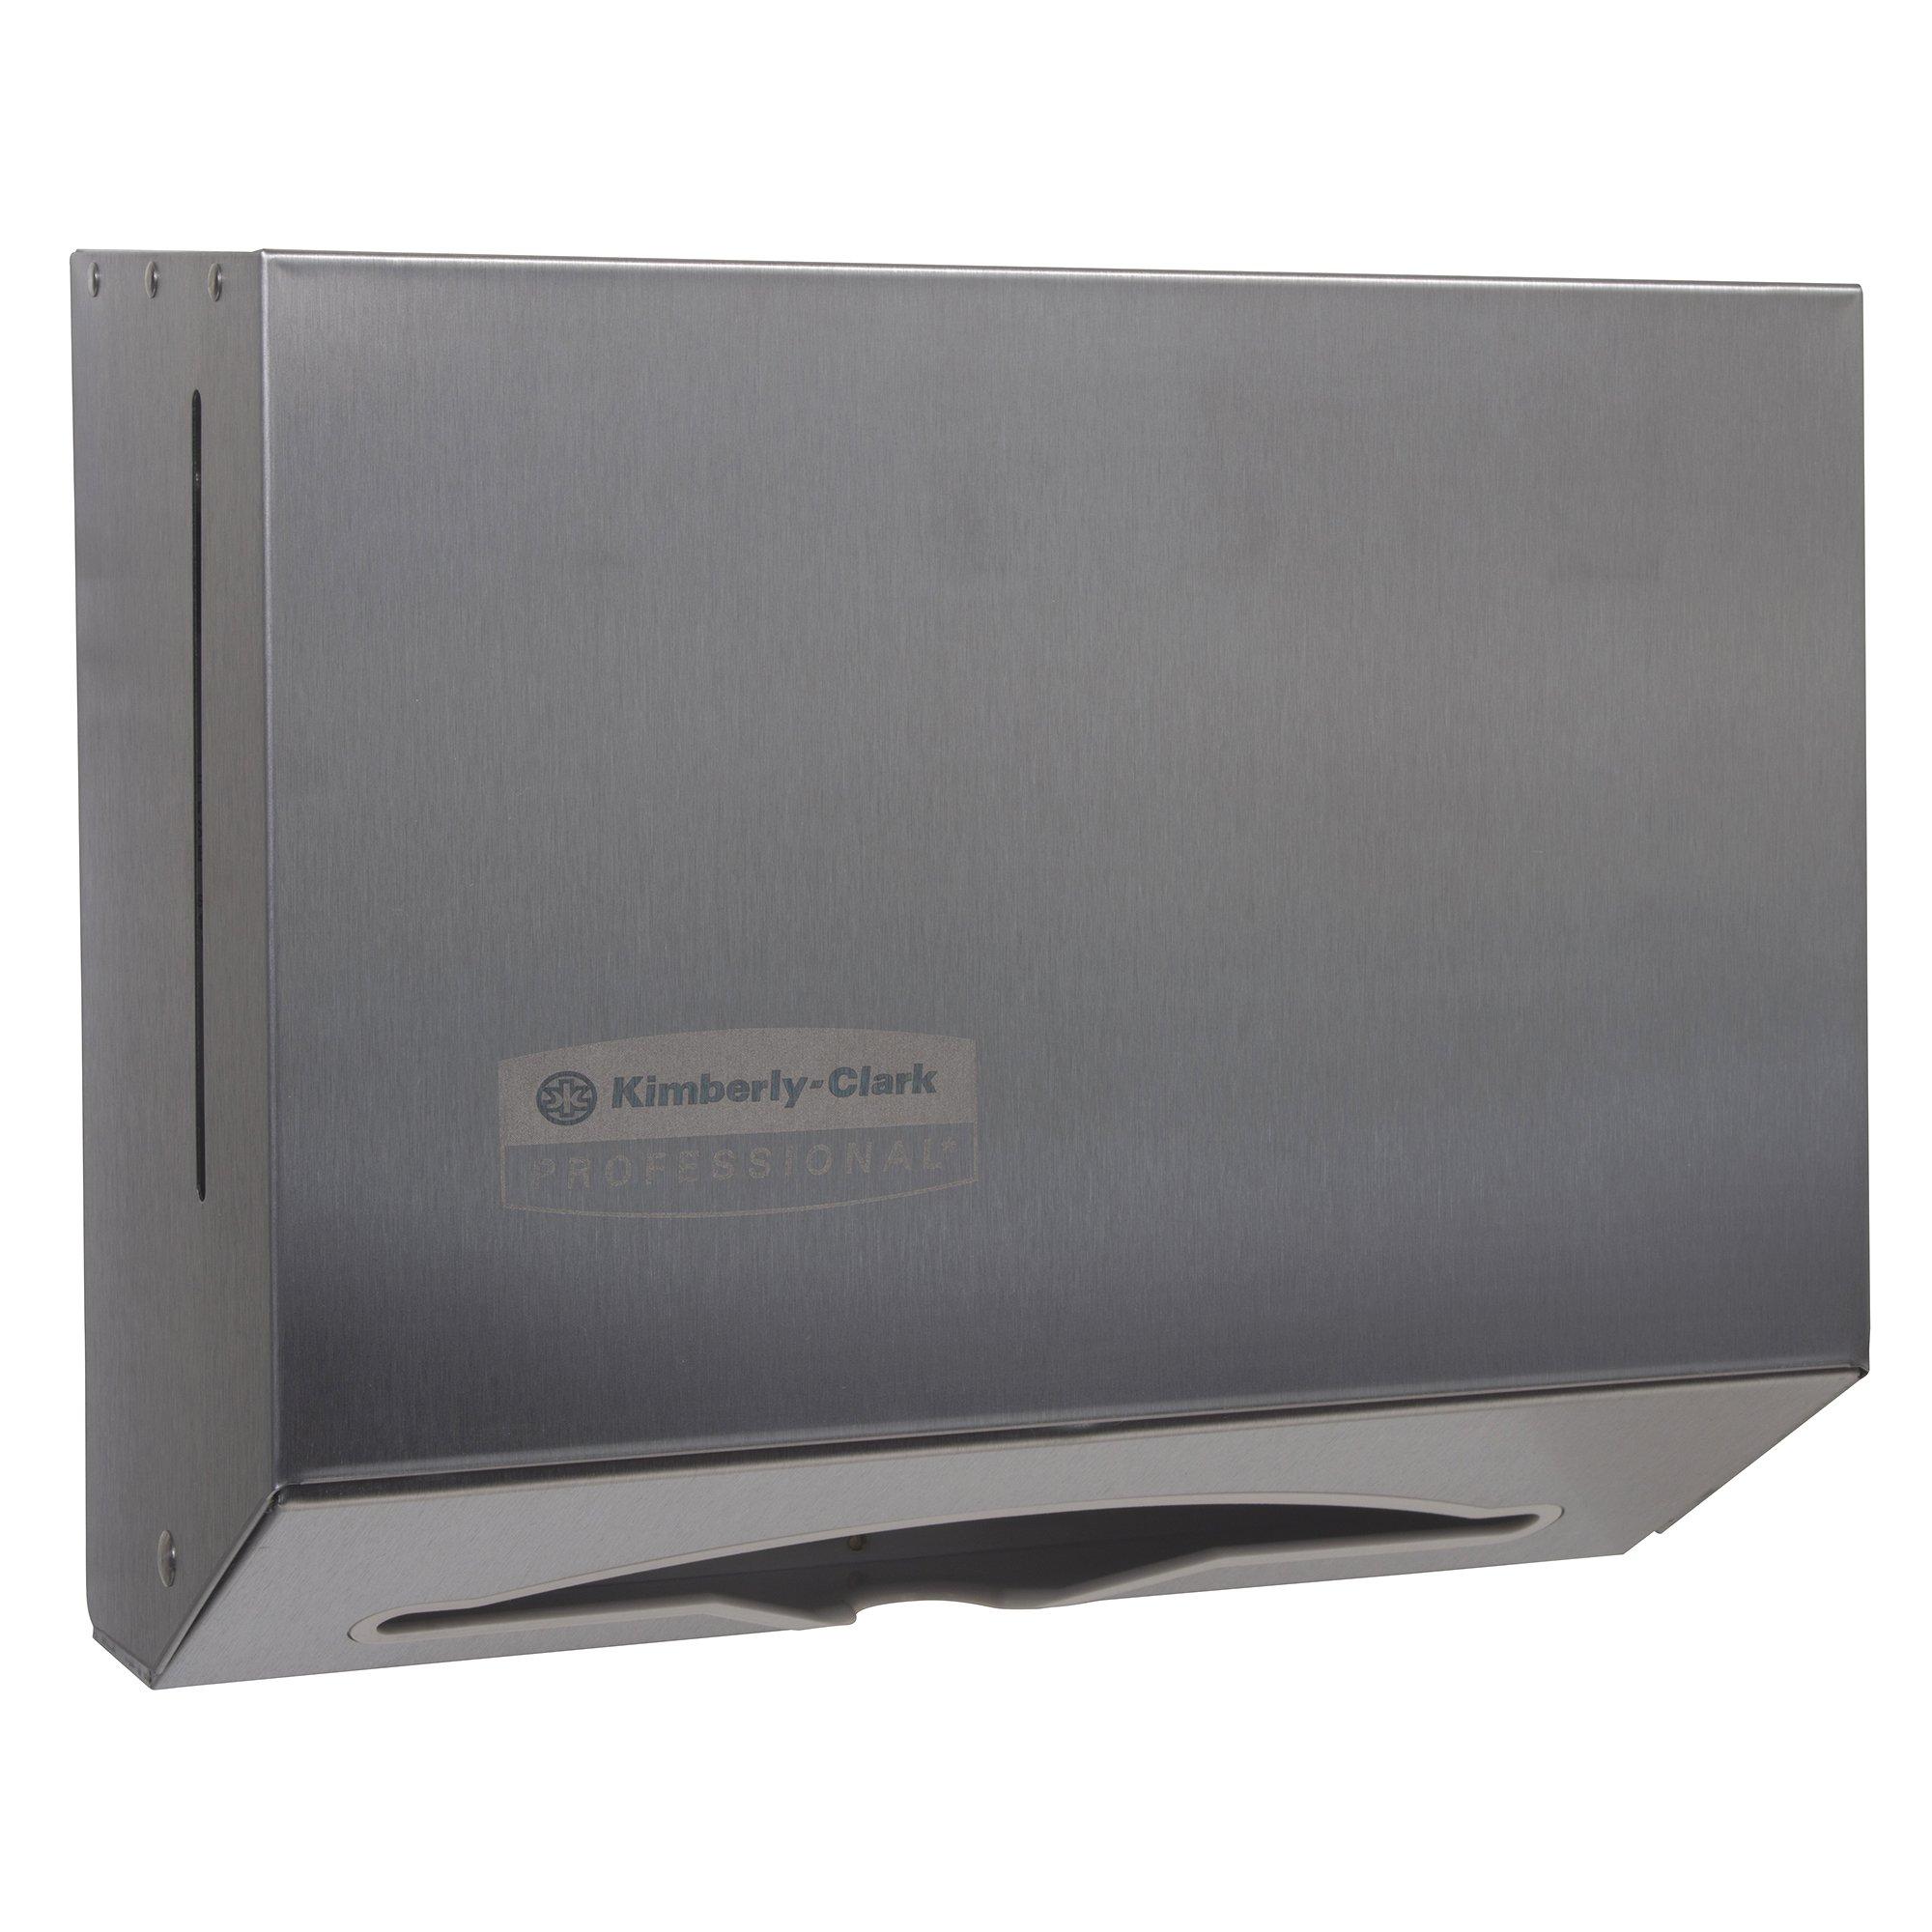 SCOTTFOLD 09216 Stainless Steel Compact Towel Dispenser